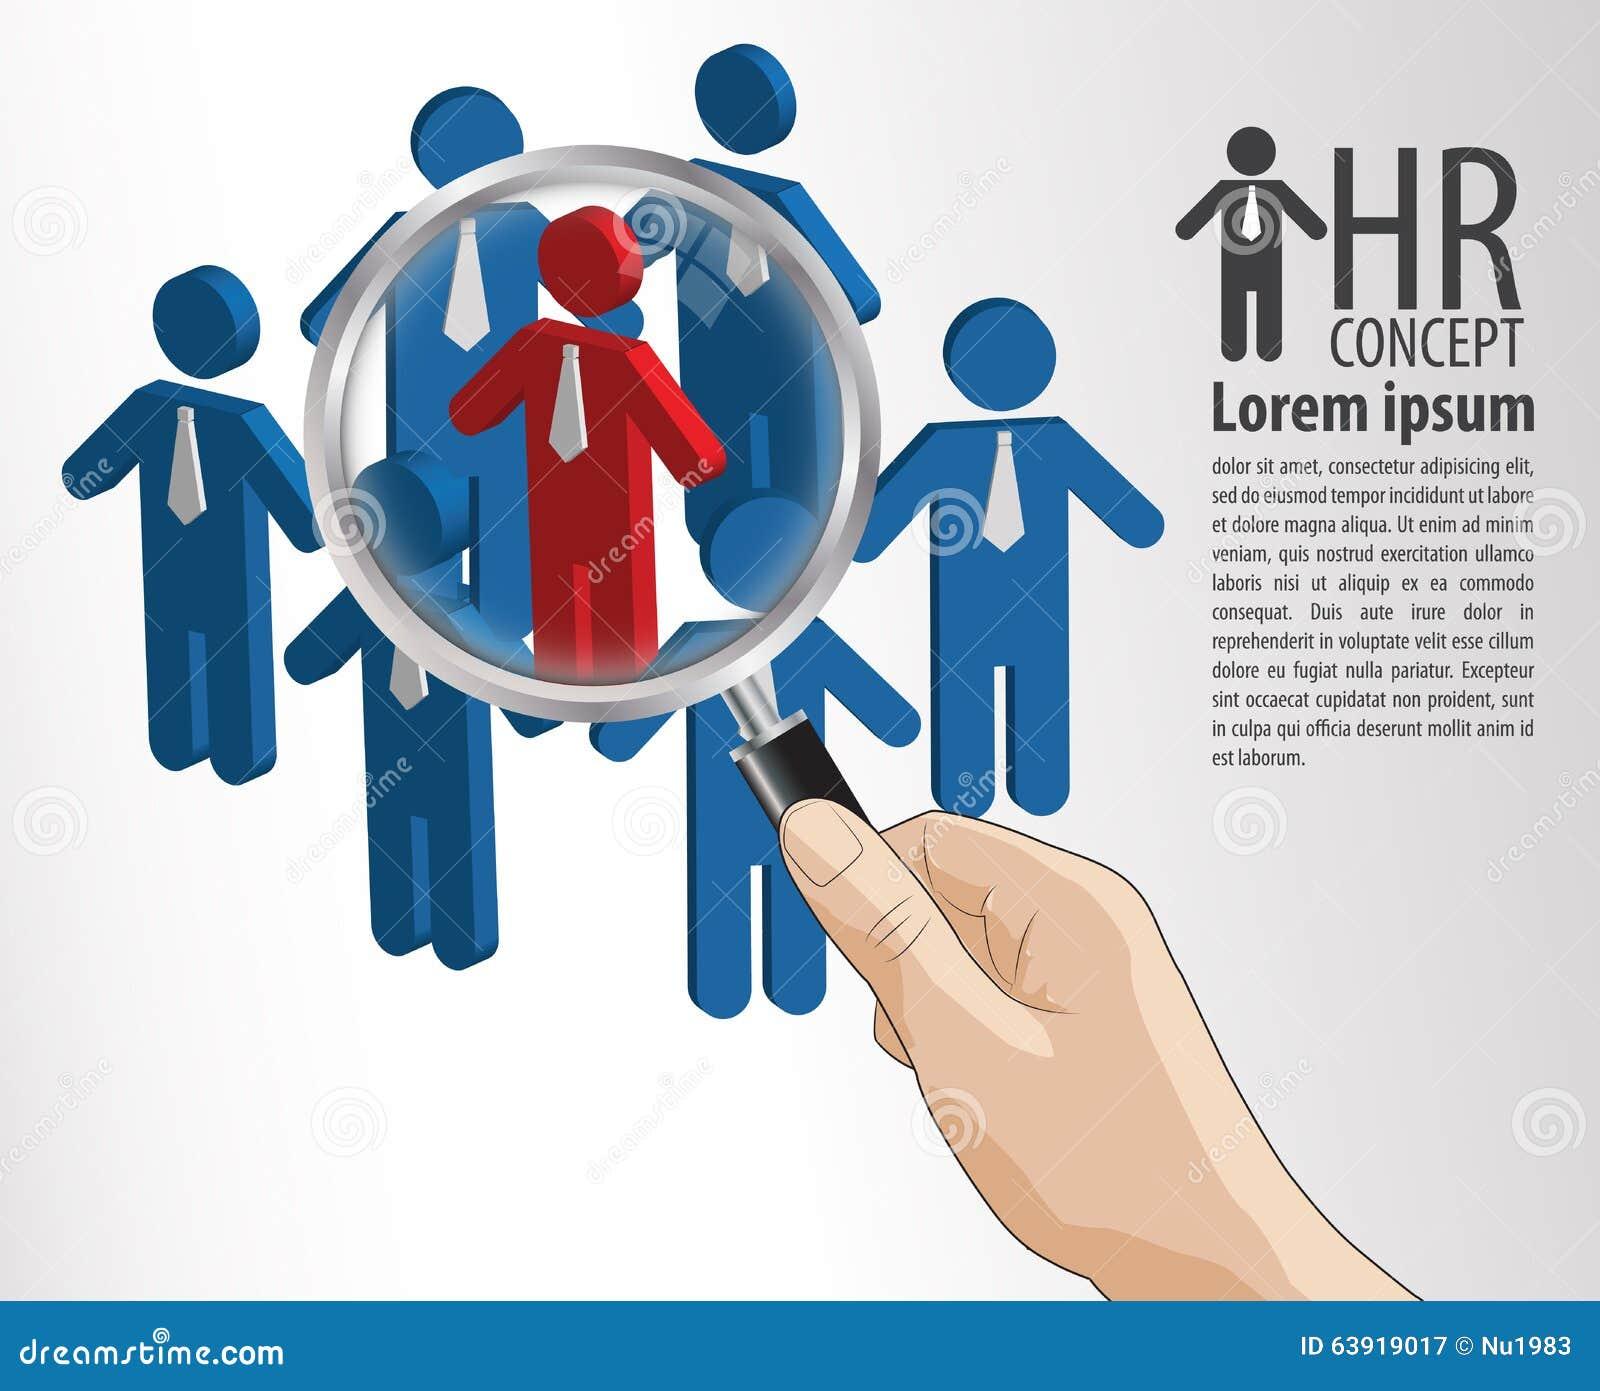 hr概念手举行放大镜寻找工作的最佳的比赛人.图片